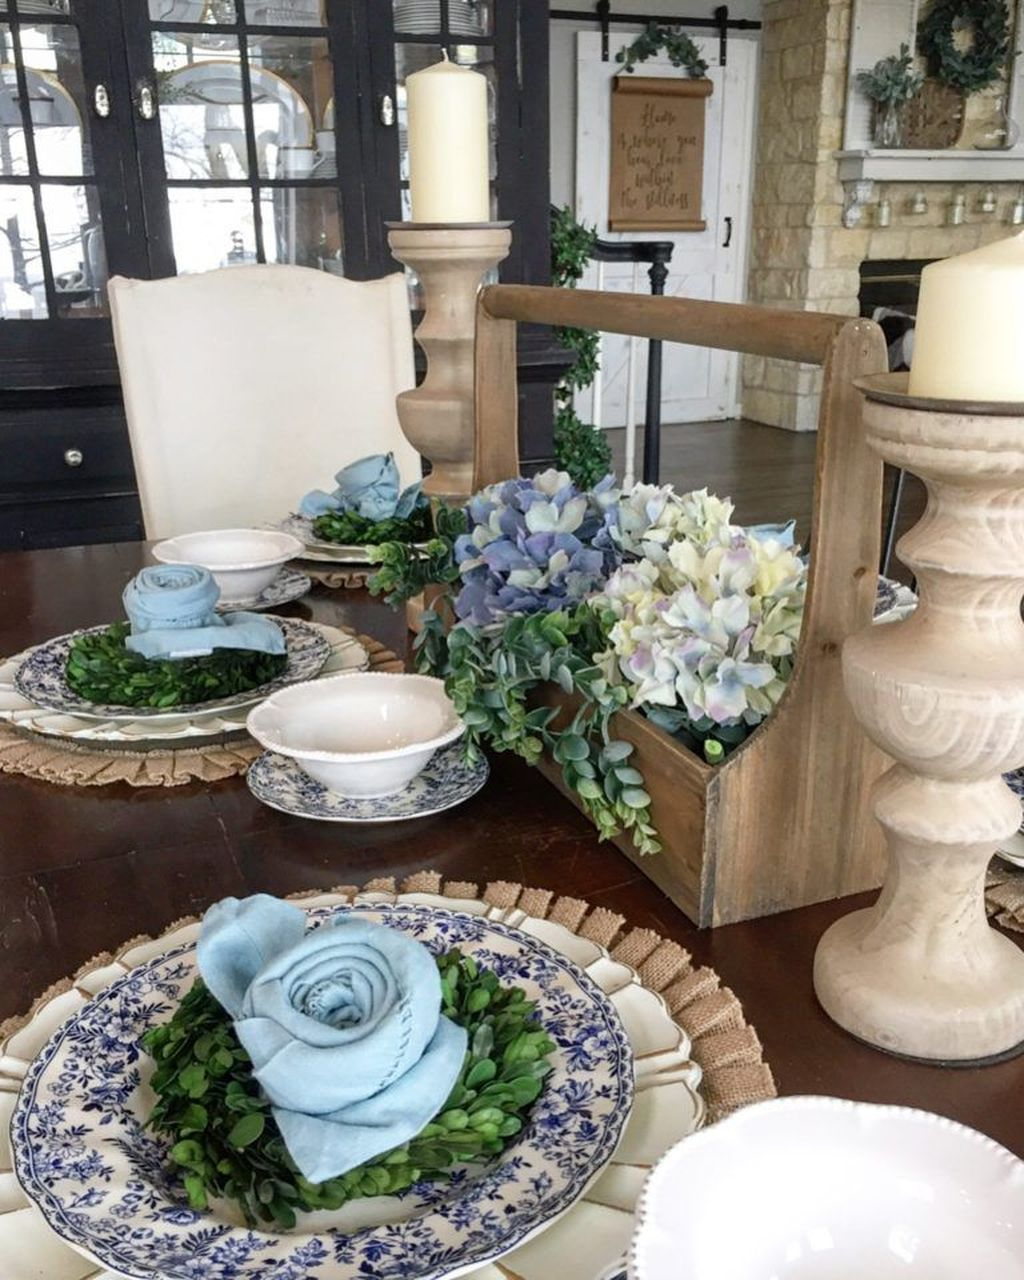 The Best Farmhouse Style Spring Tablescape Decor Ideas 22